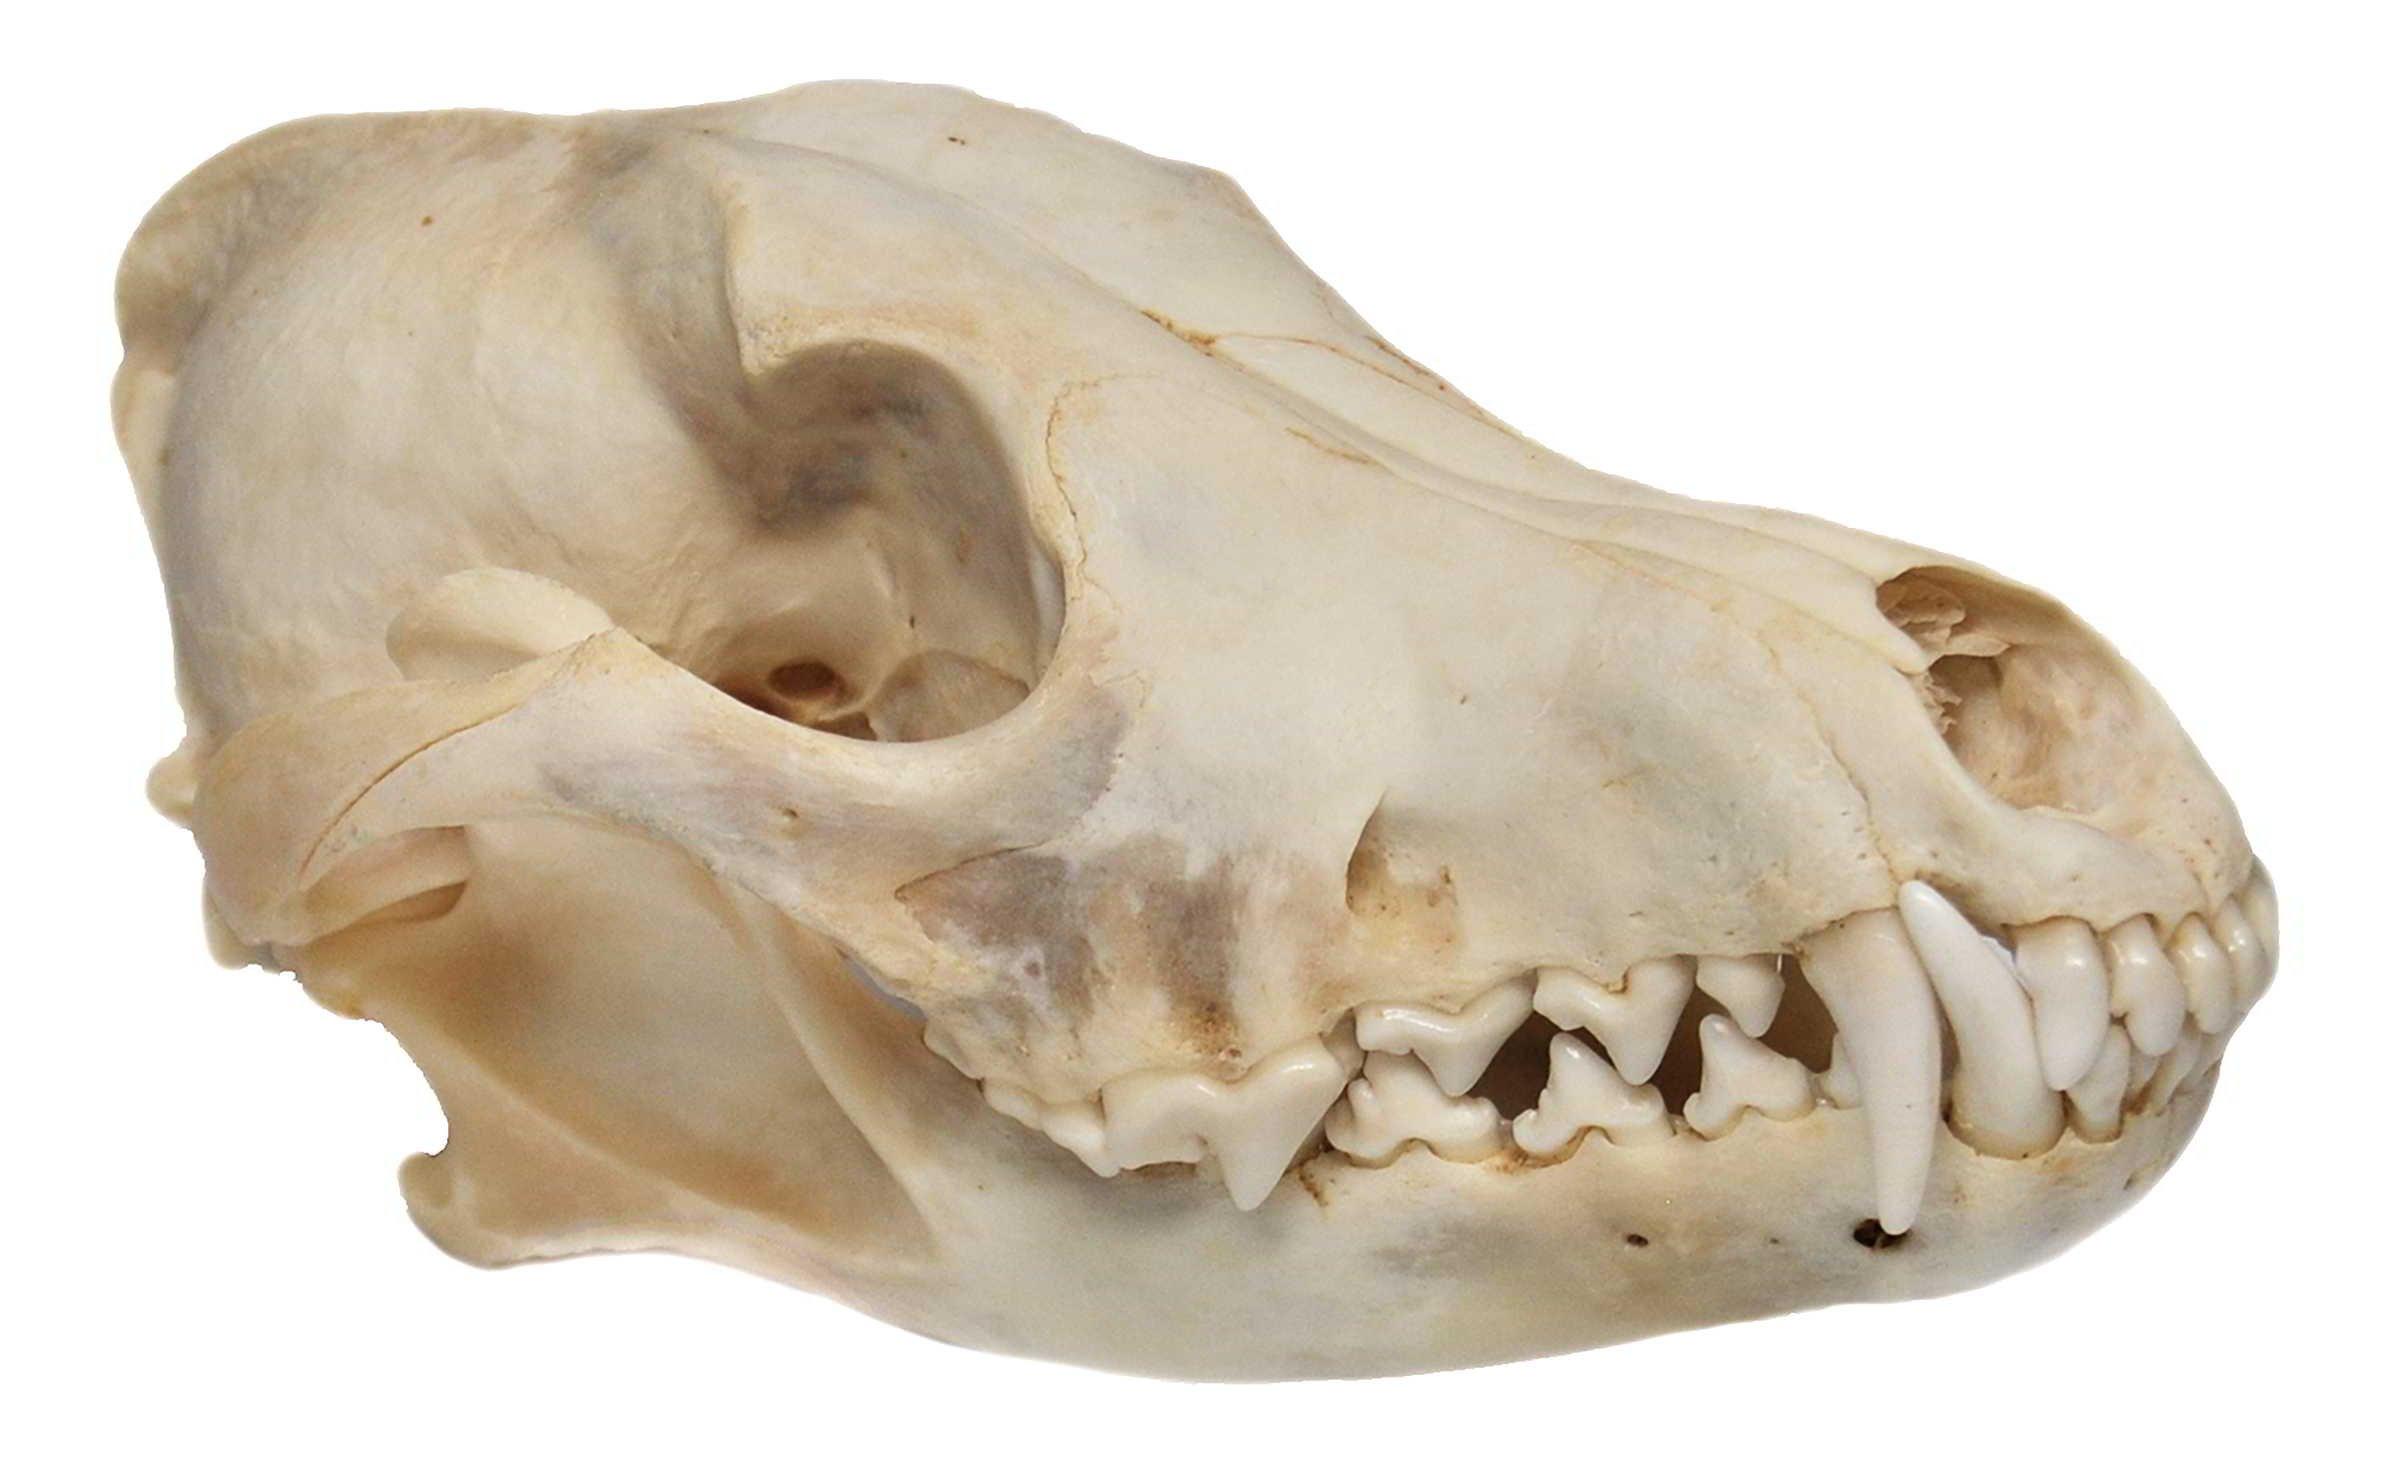 Coyote skull anatomy - photo#36